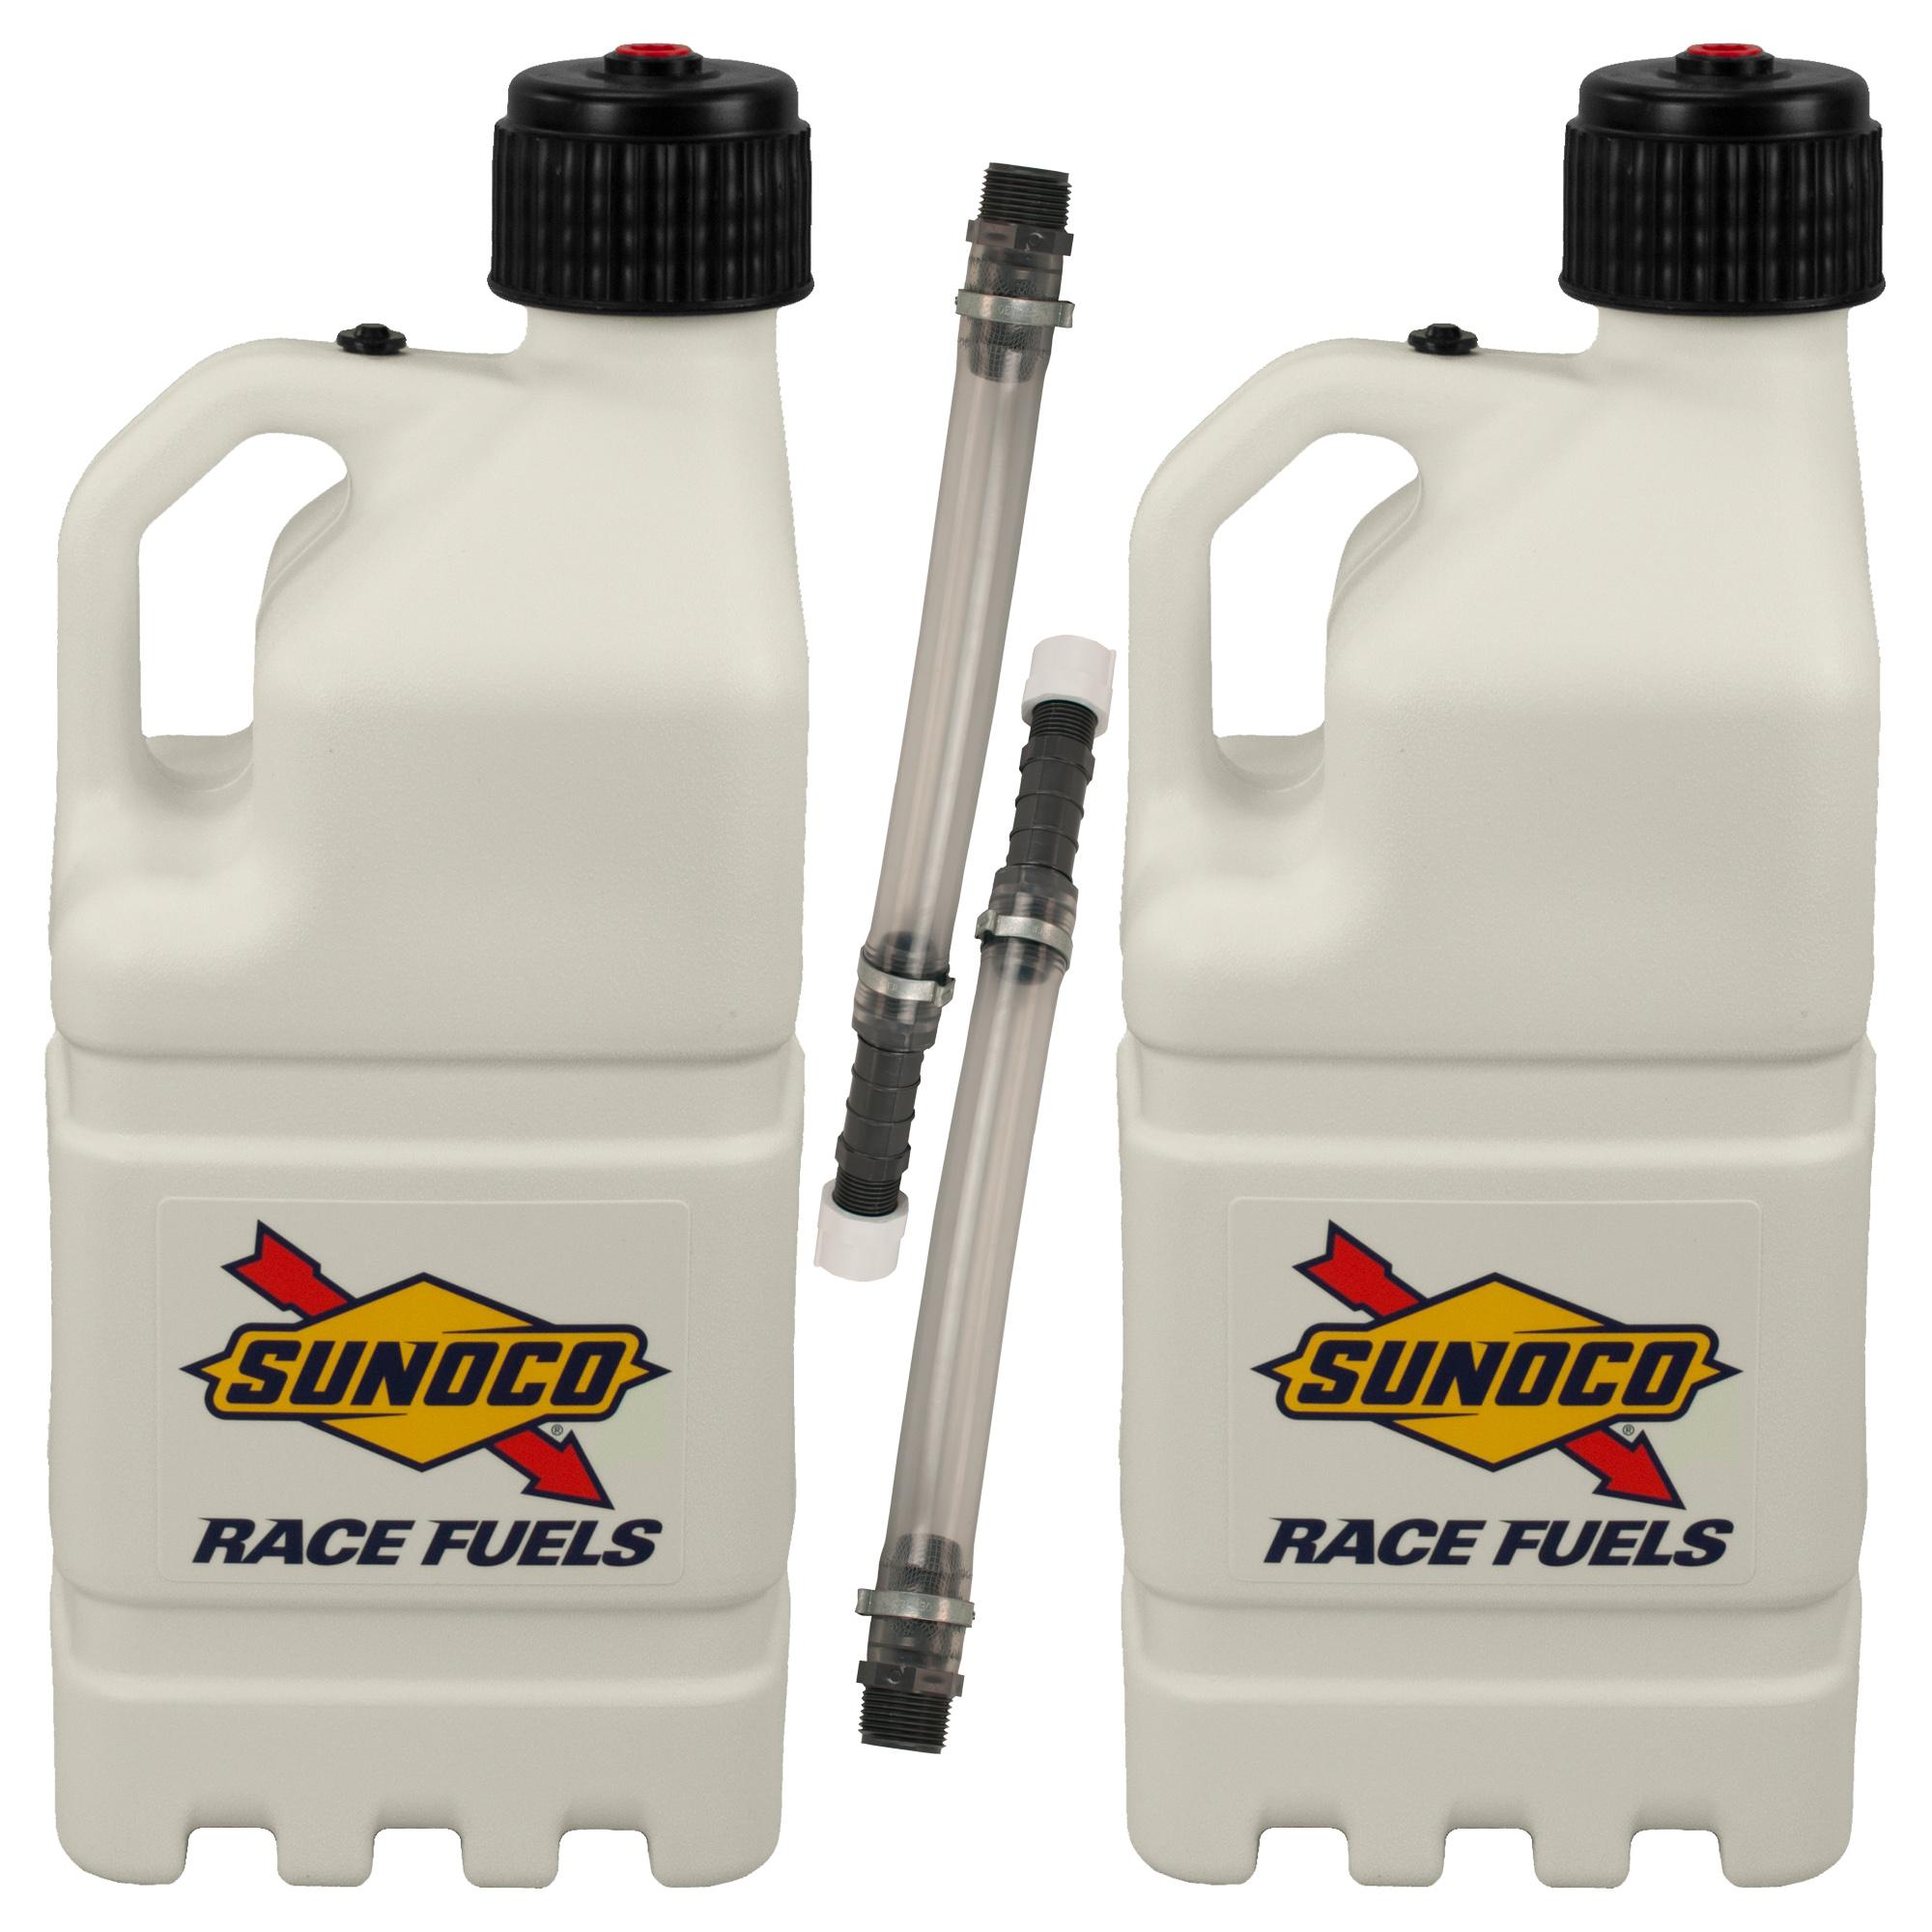 2 Pack Sunoco Racing White 5 Gallon Race Utility Jugs